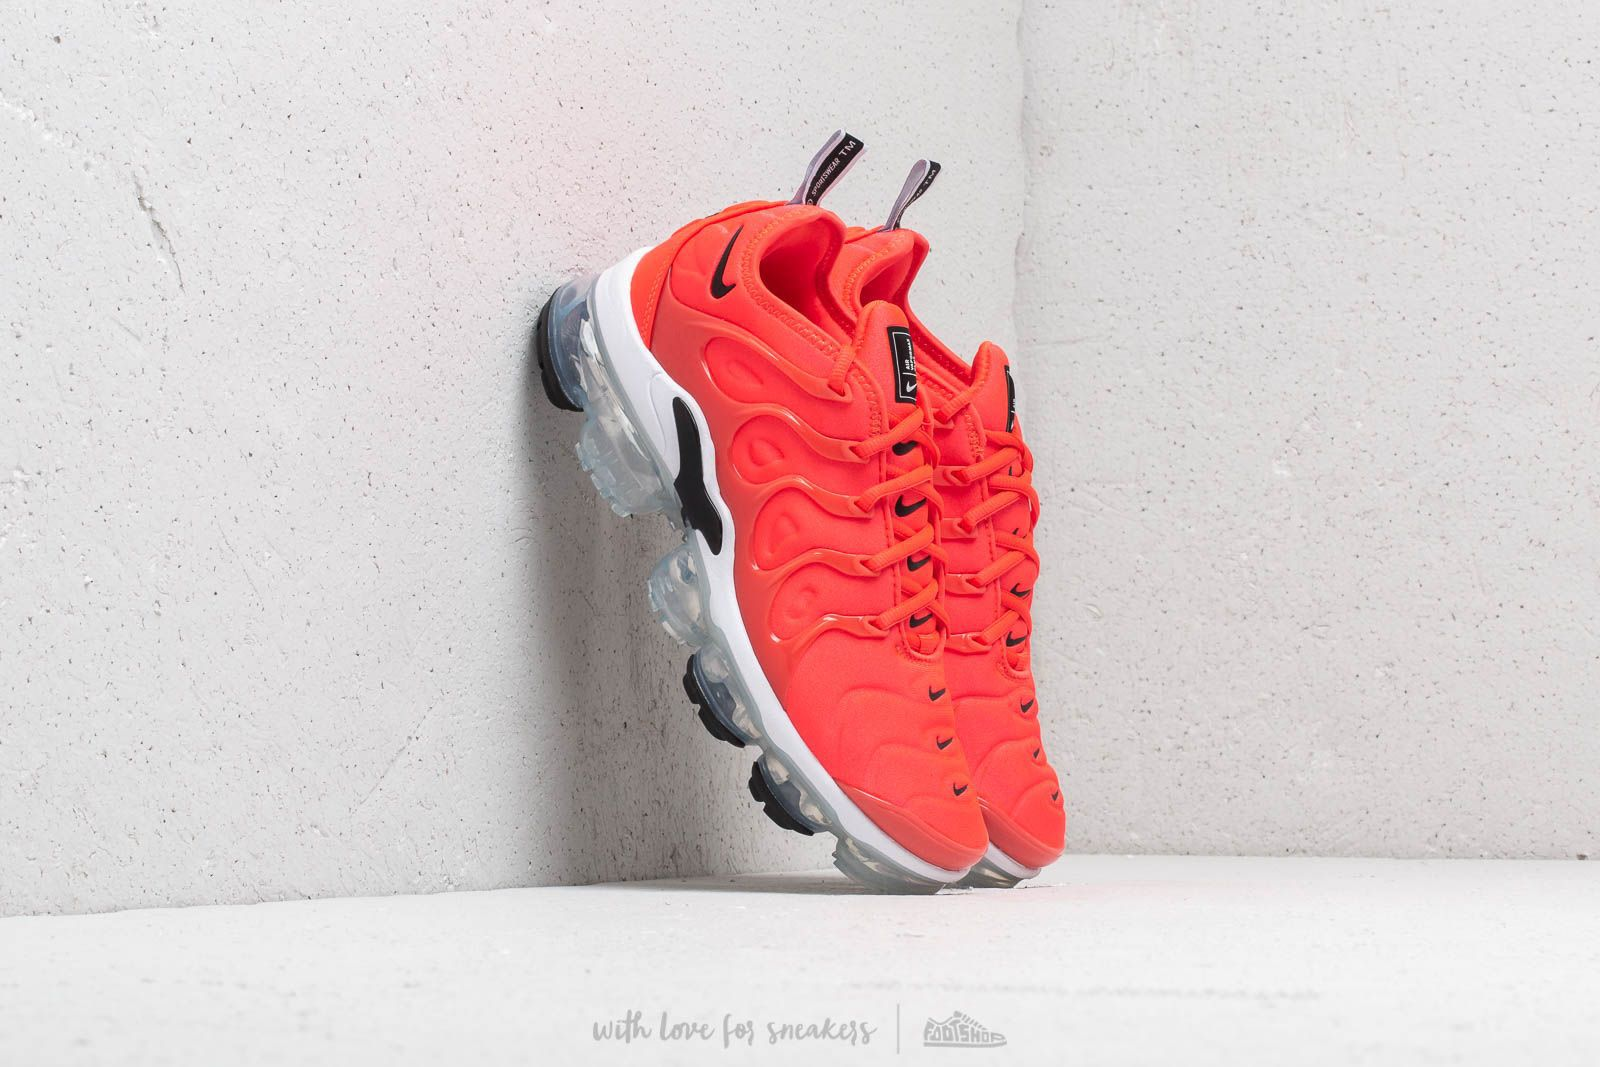 67ac90012c2 Nike Air Vapormax Plus Bright Crimson/ Black-White | Footshop